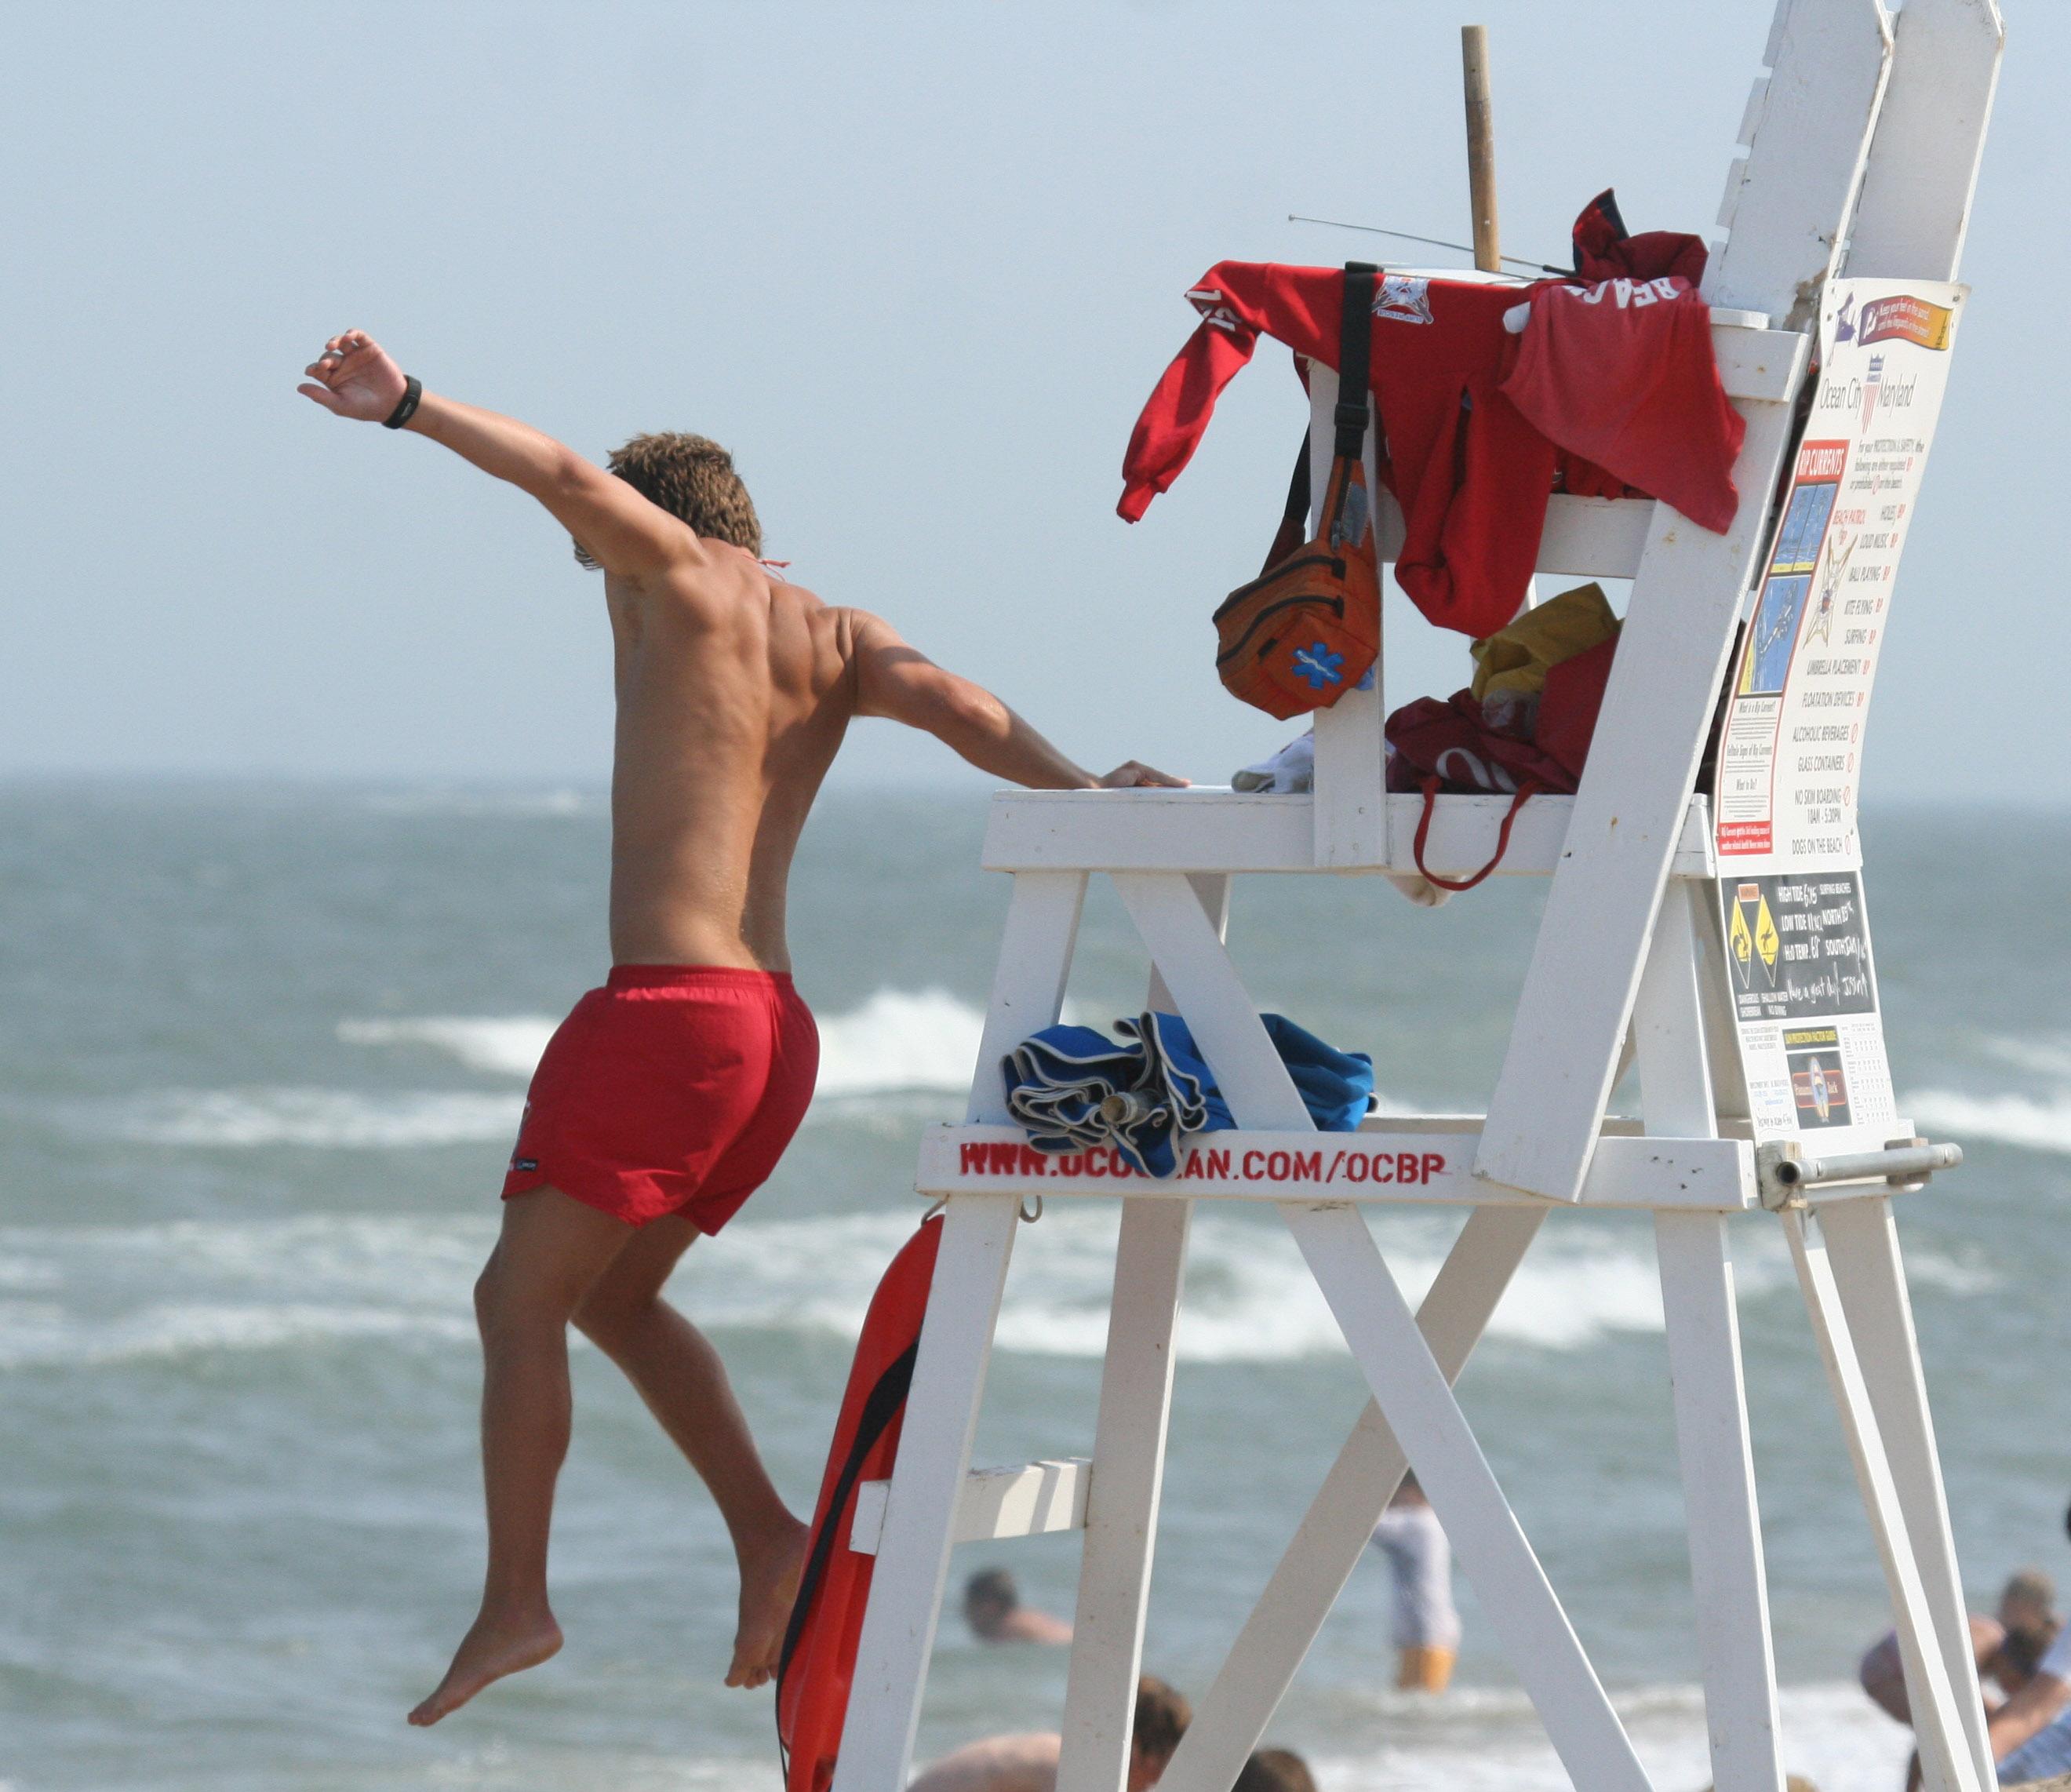 https://i0.wp.com/upload.wikimedia.org/wikipedia/commons/b/b4/Lifeguard_jumping_into_action,_Ocean_City,_June_27_,2007.jpg